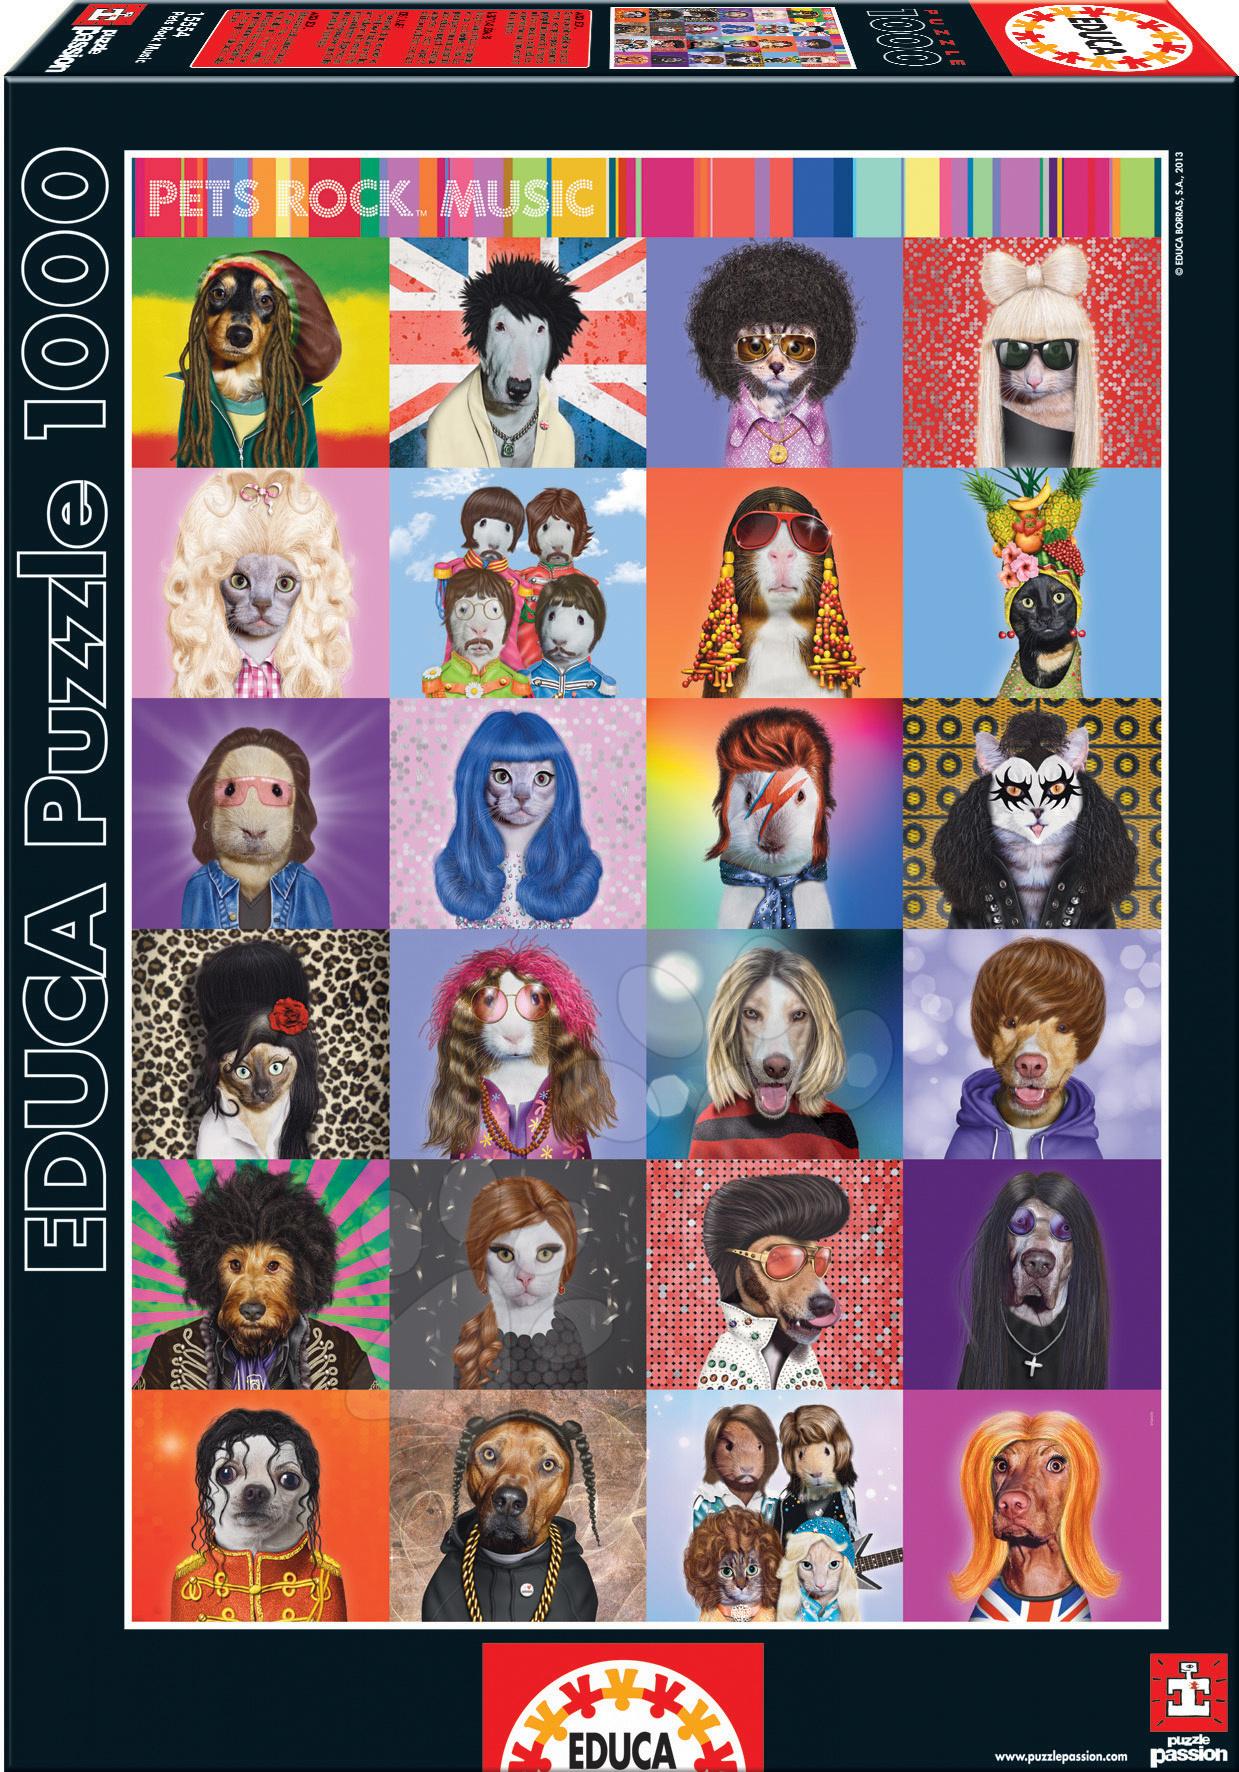 Puzzle 1000 dílků - Puzzle Pets Rock Music Educa 1000 dílů od 12 let